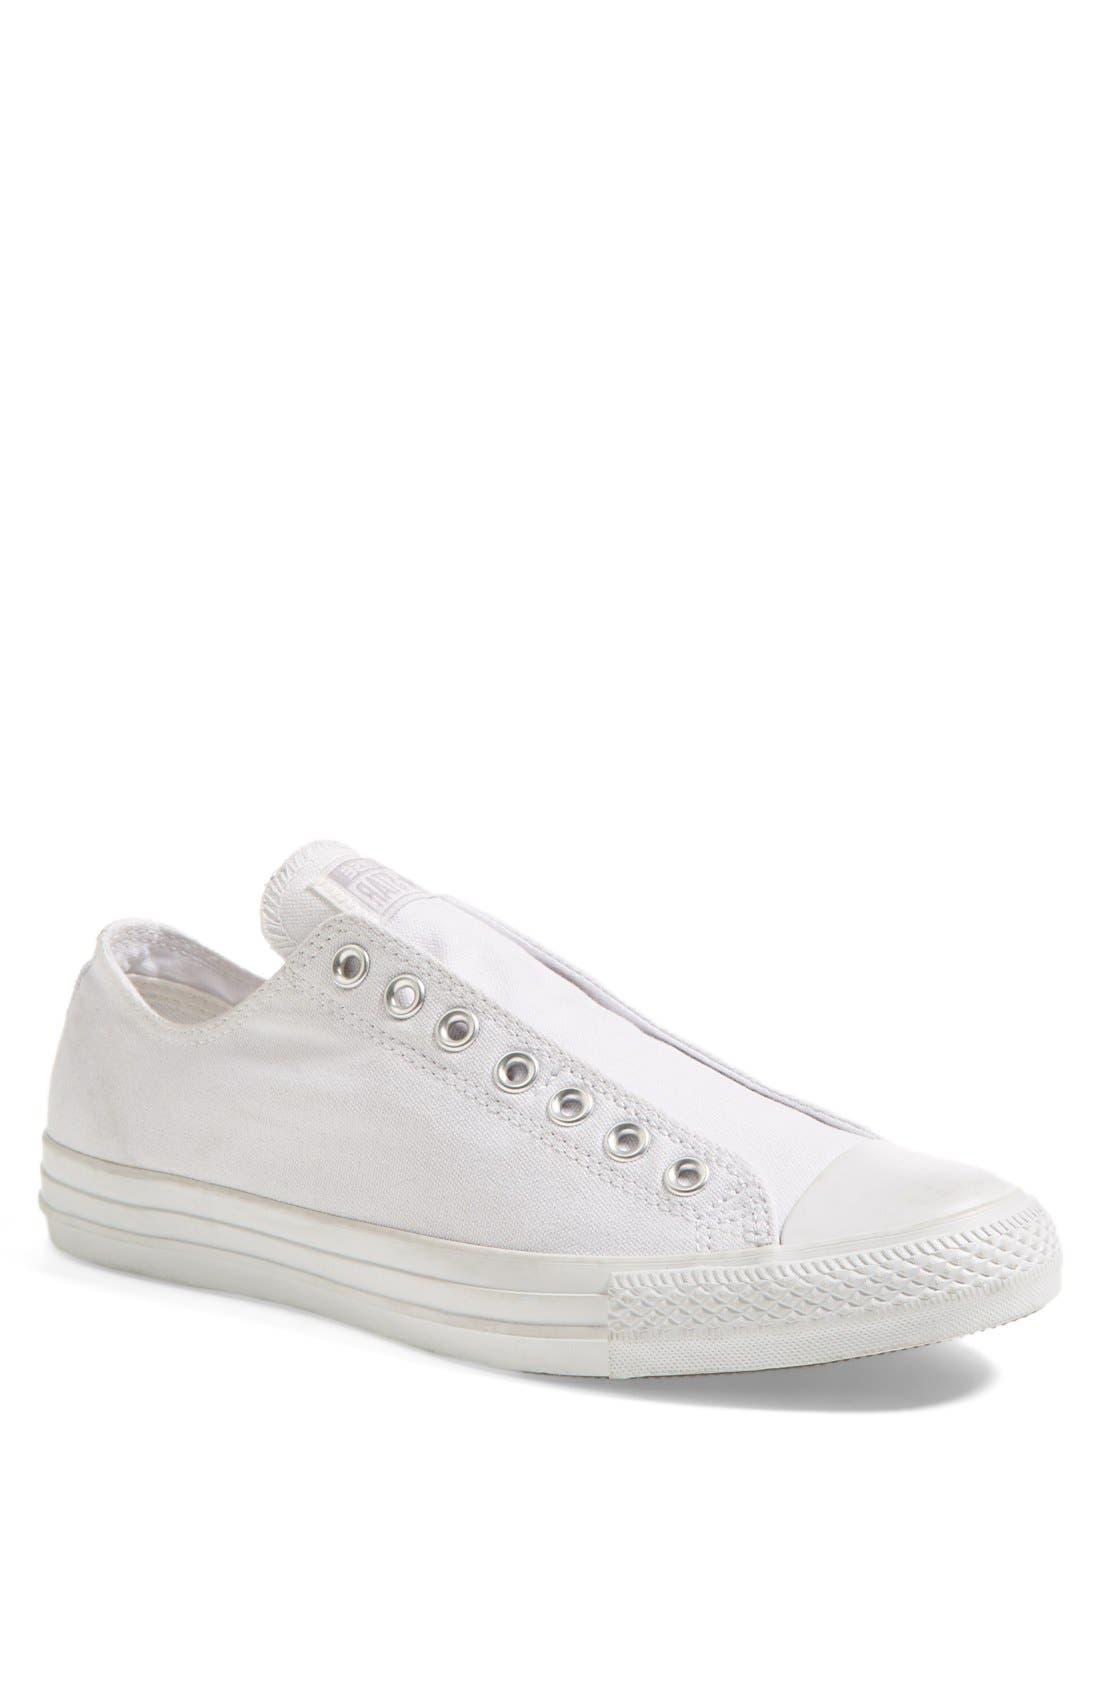 Alternate Image 1 Selected - Converse Chuck Taylor® All Star® Slip-On Sneaker (Men)